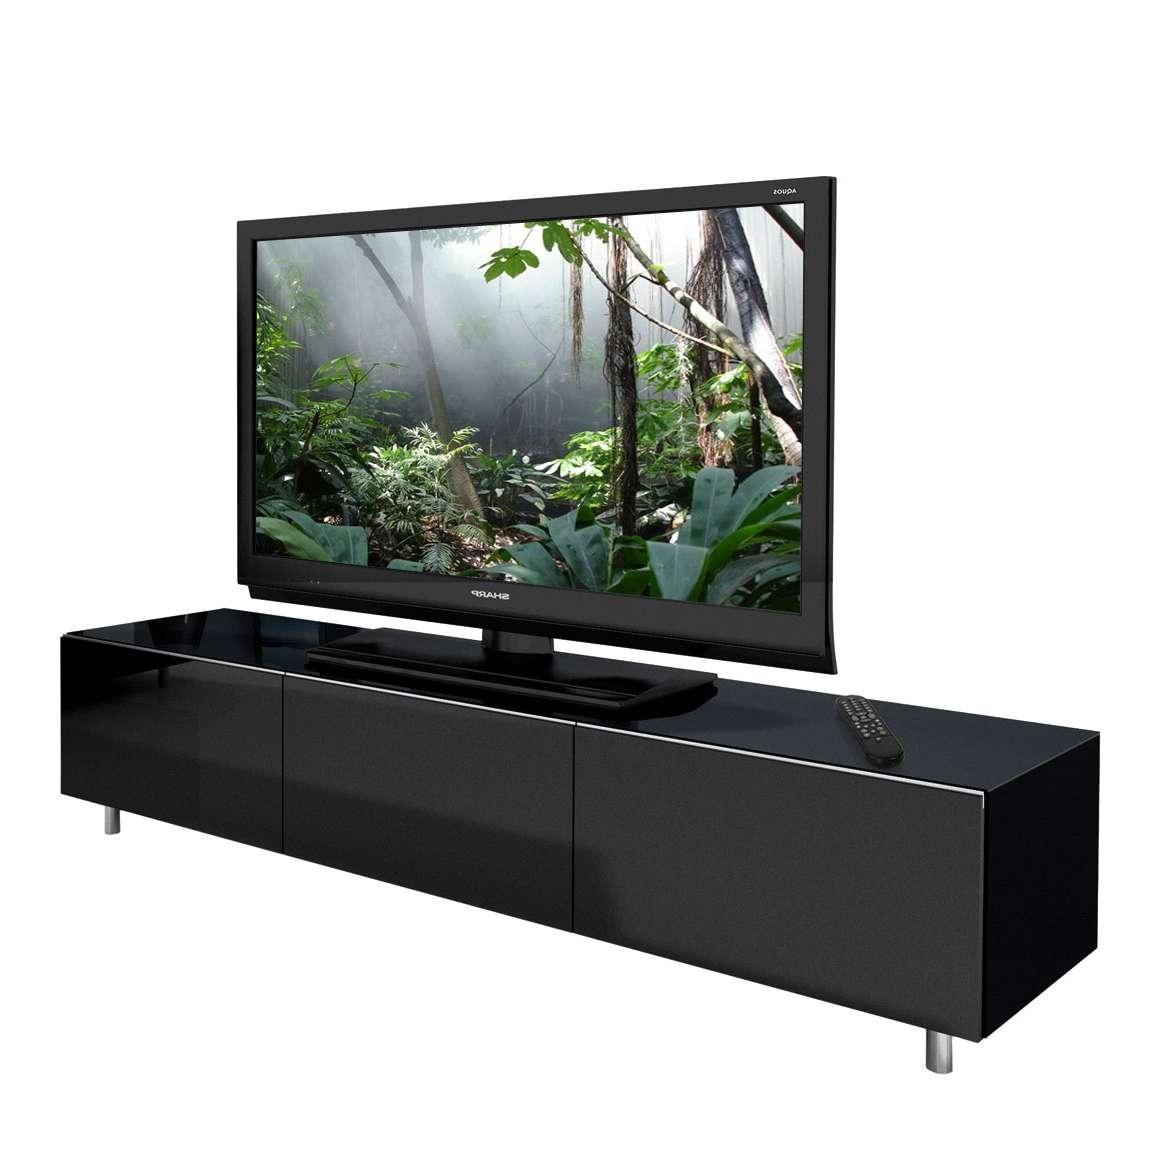 Just Racks Jrl1650 Gloss Black Tv Cabinet – Black Tv Stands Inside Black Gloss Tv Cabinets (View 8 of 20)